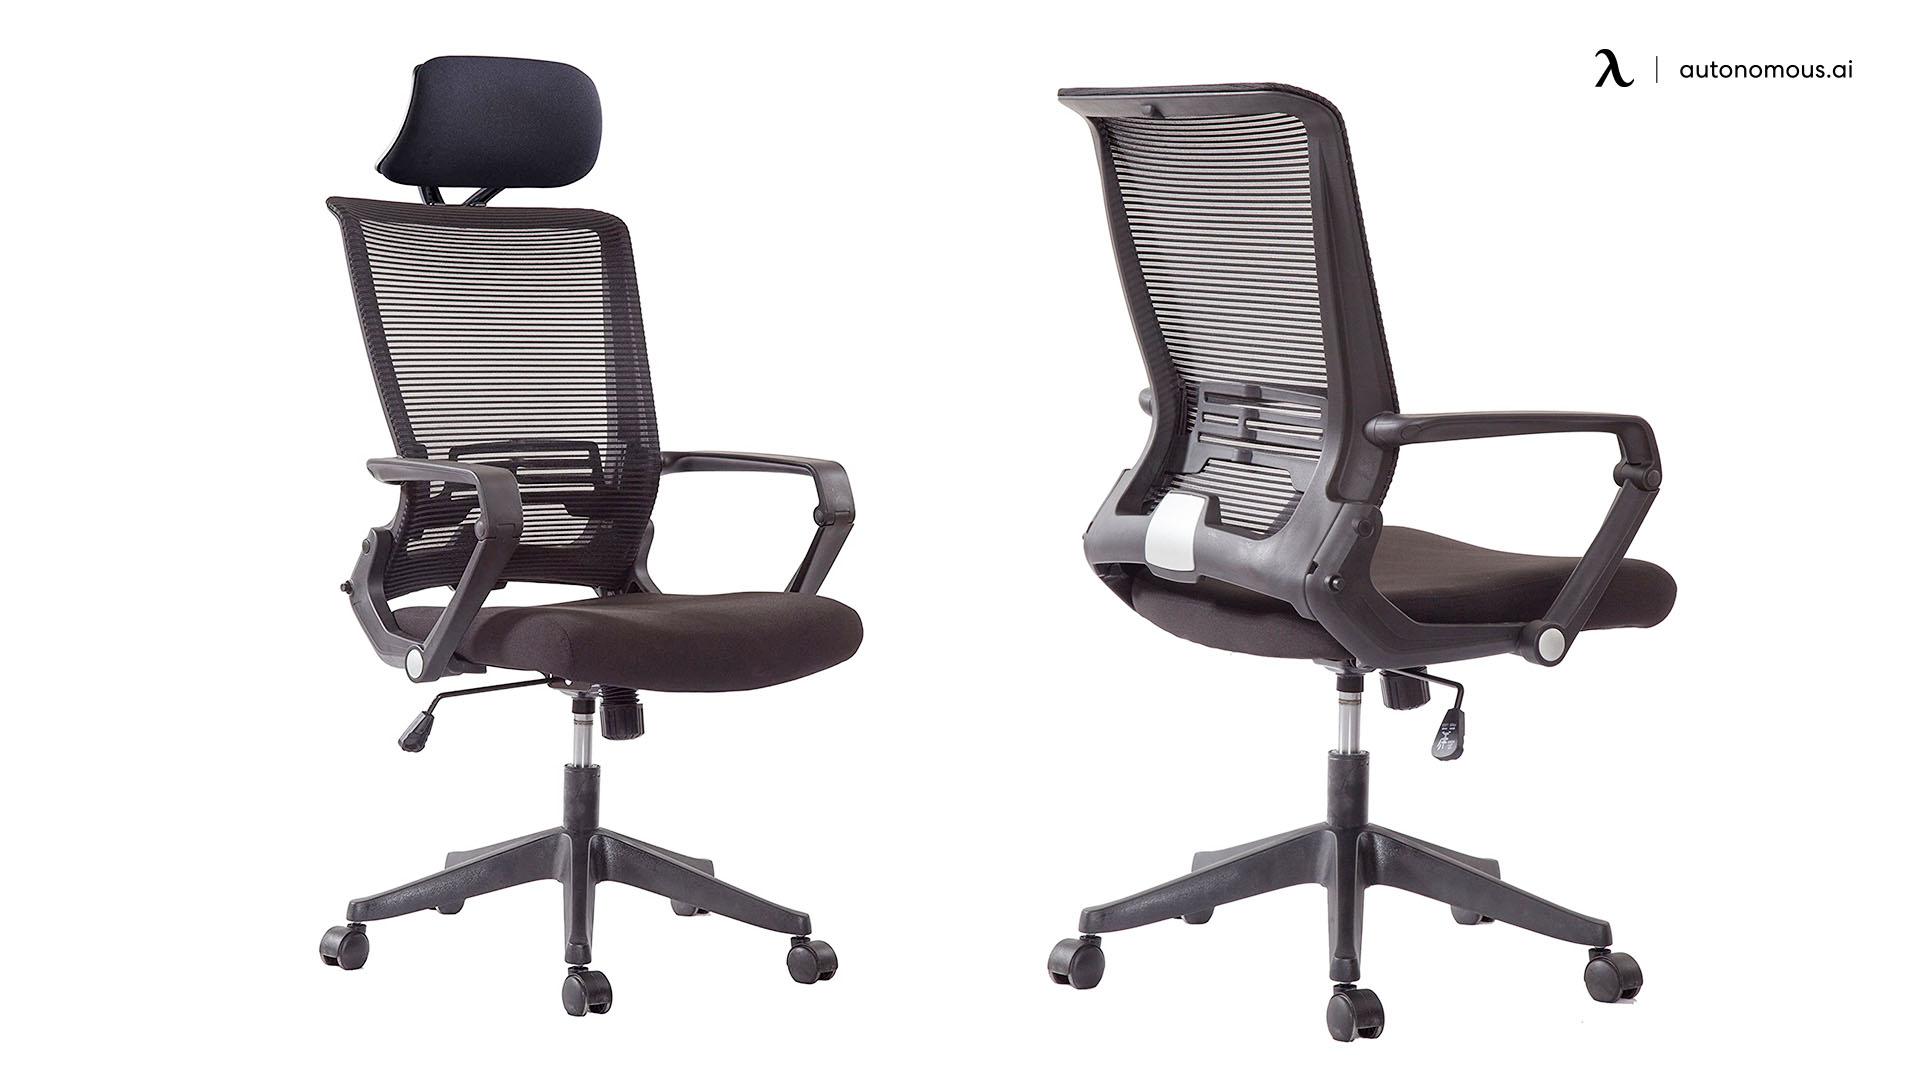 The CJS Kiro Ergonomic Foldable Office Chair